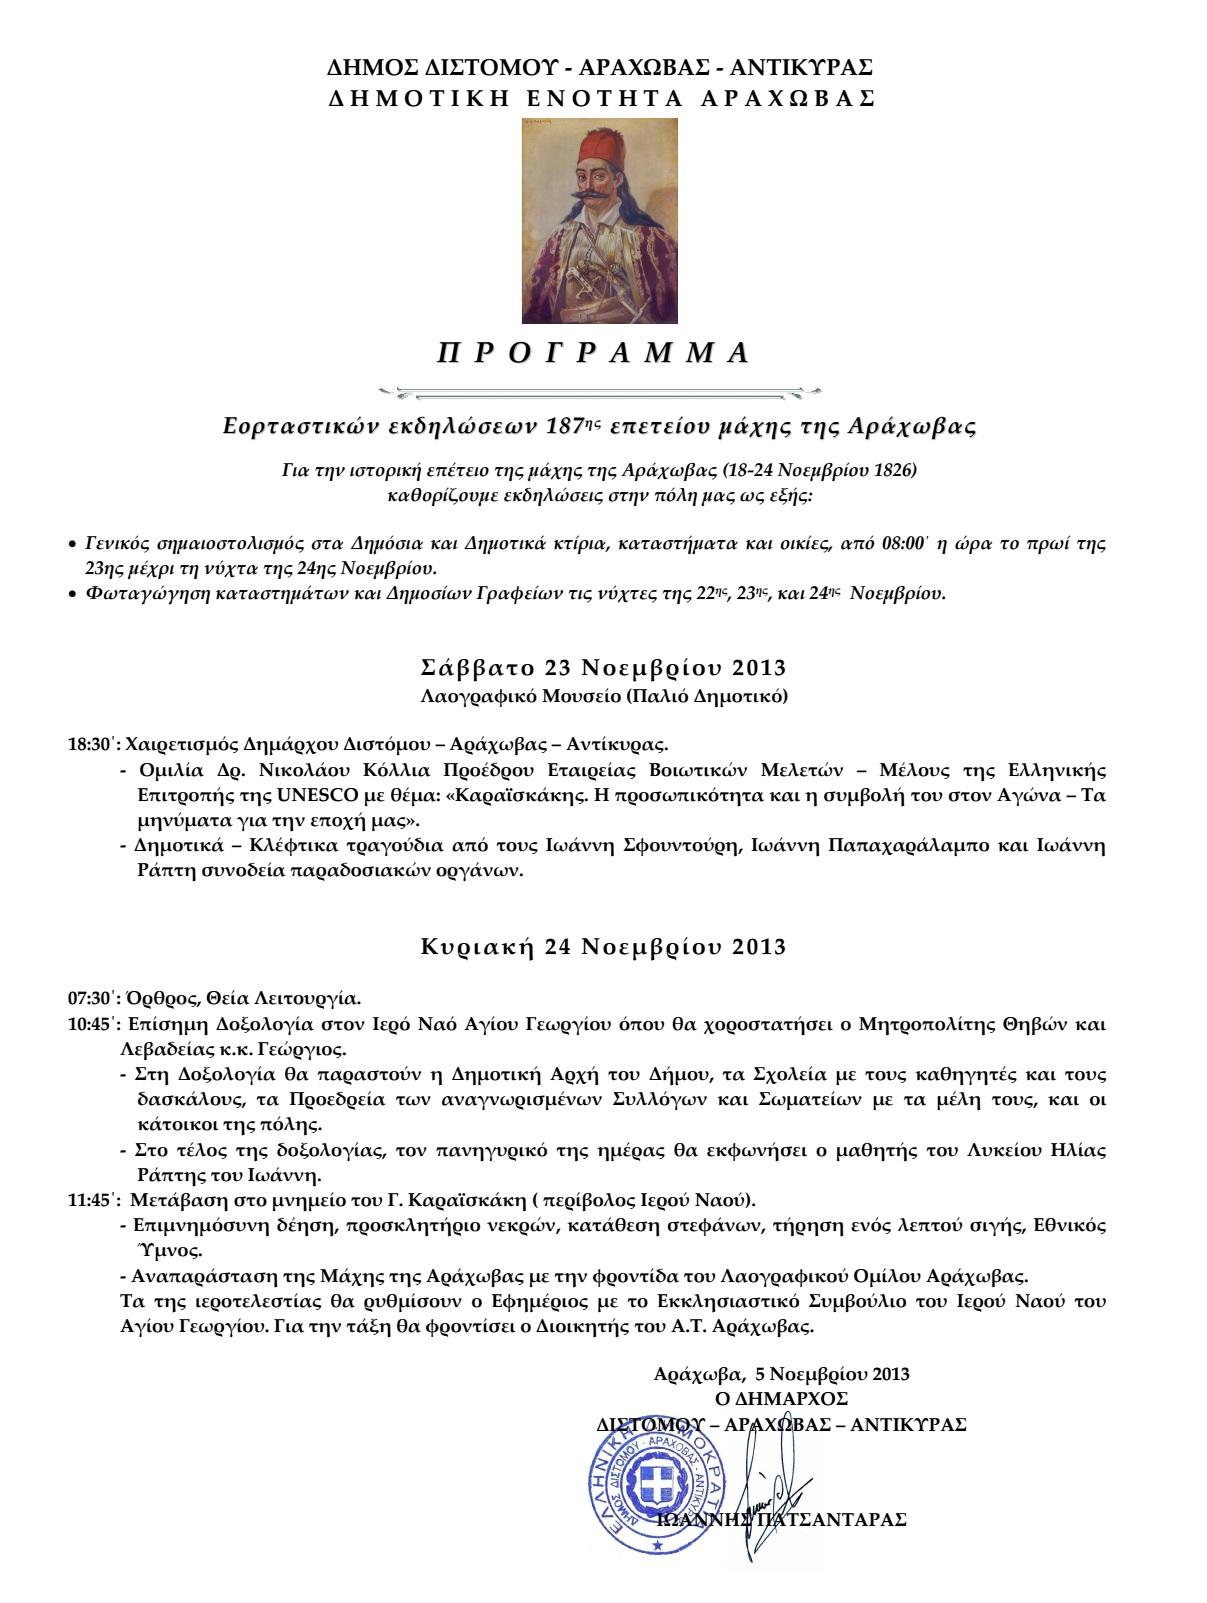 maxh_arachovas_2013